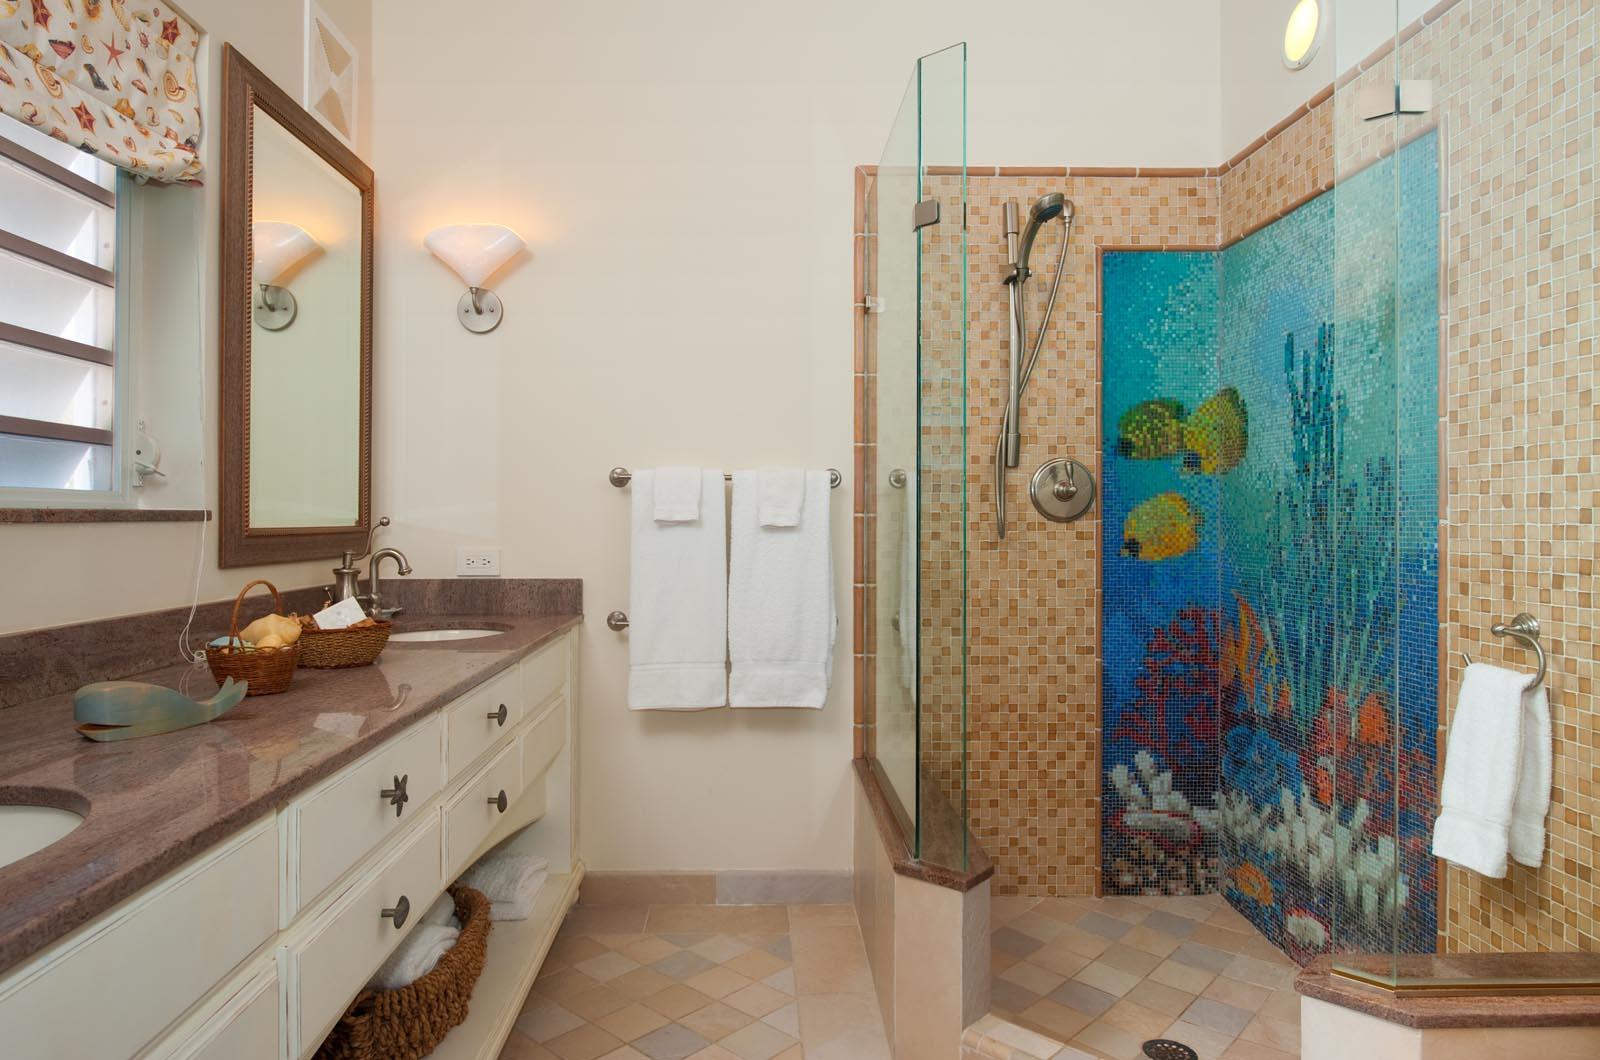 100 100 ocean themed bathroom ideas agreeable outstanding d